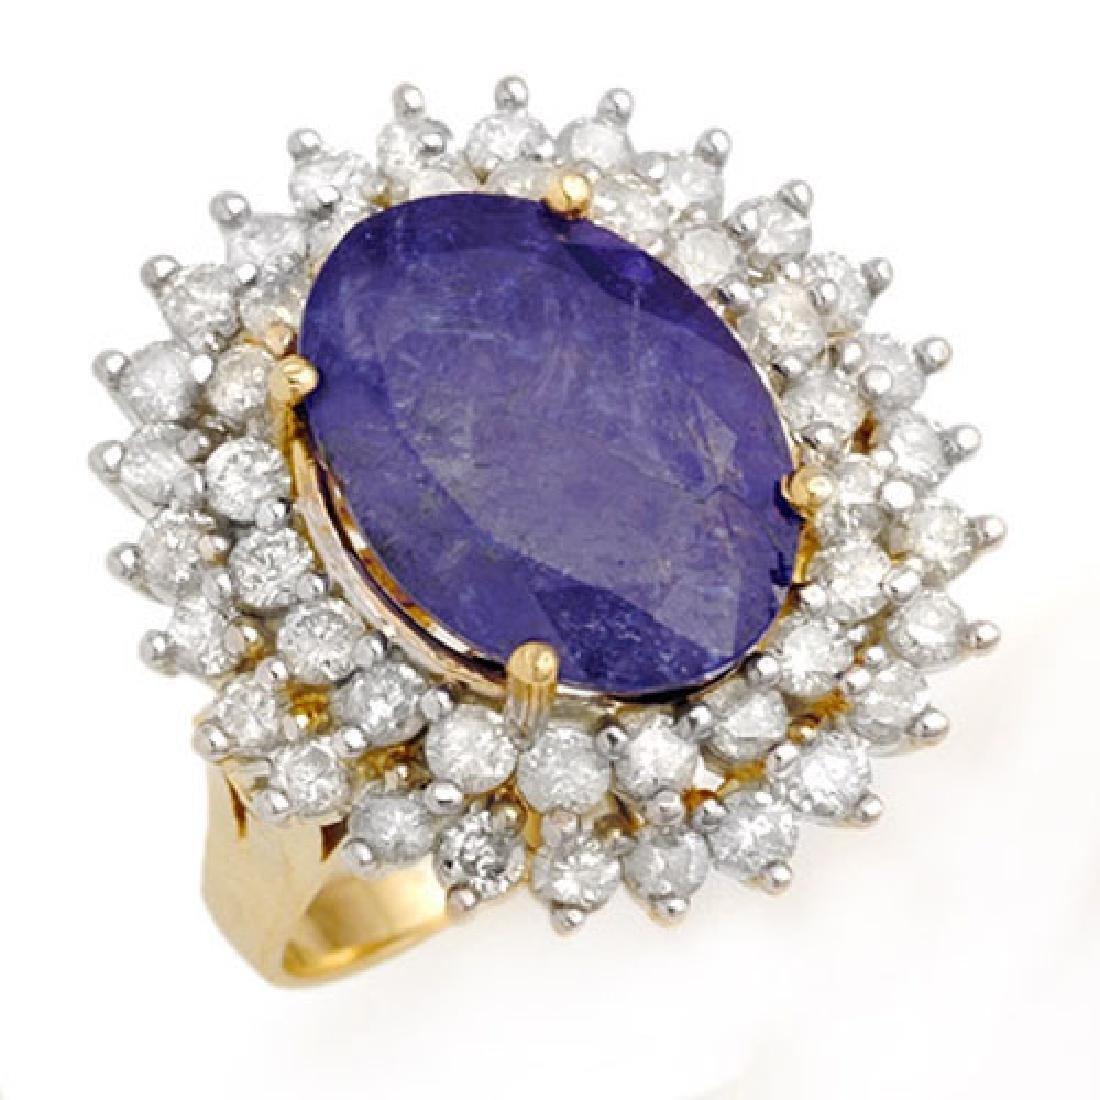 8.78 CTW Tanzanite & Diamond Ring 14K Yellow Gold